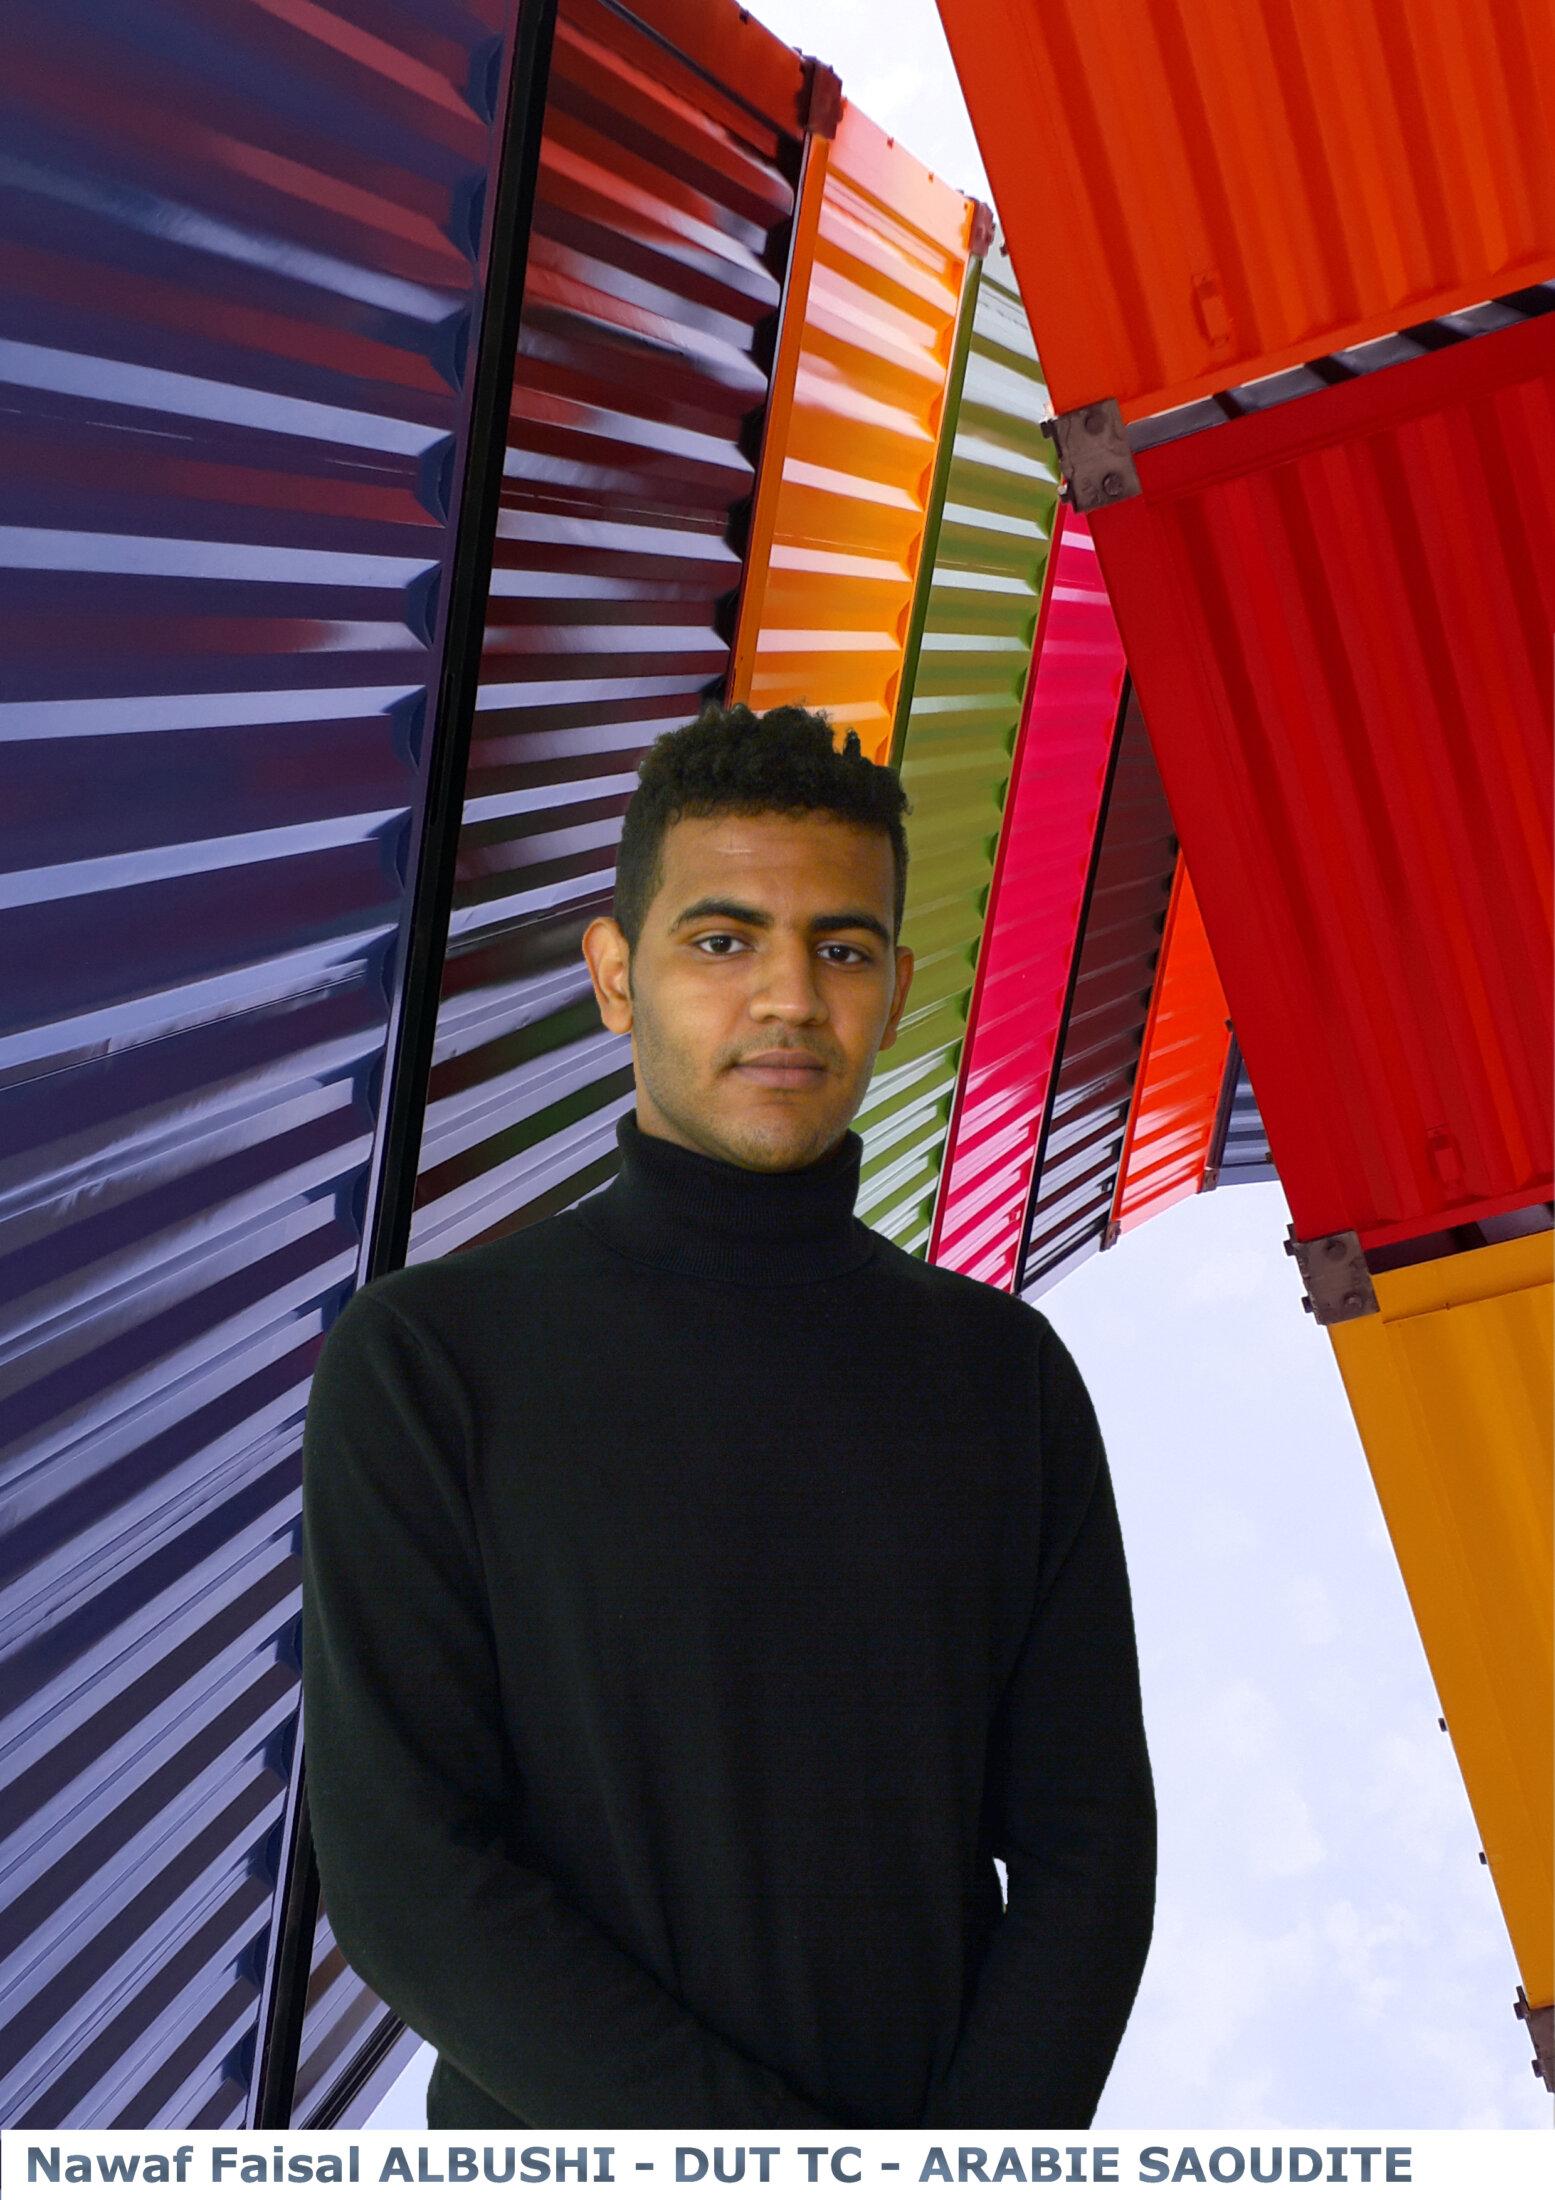 Nawaf Faisal ALBUSHI - DUT TC - ARABIE SAOUDITE